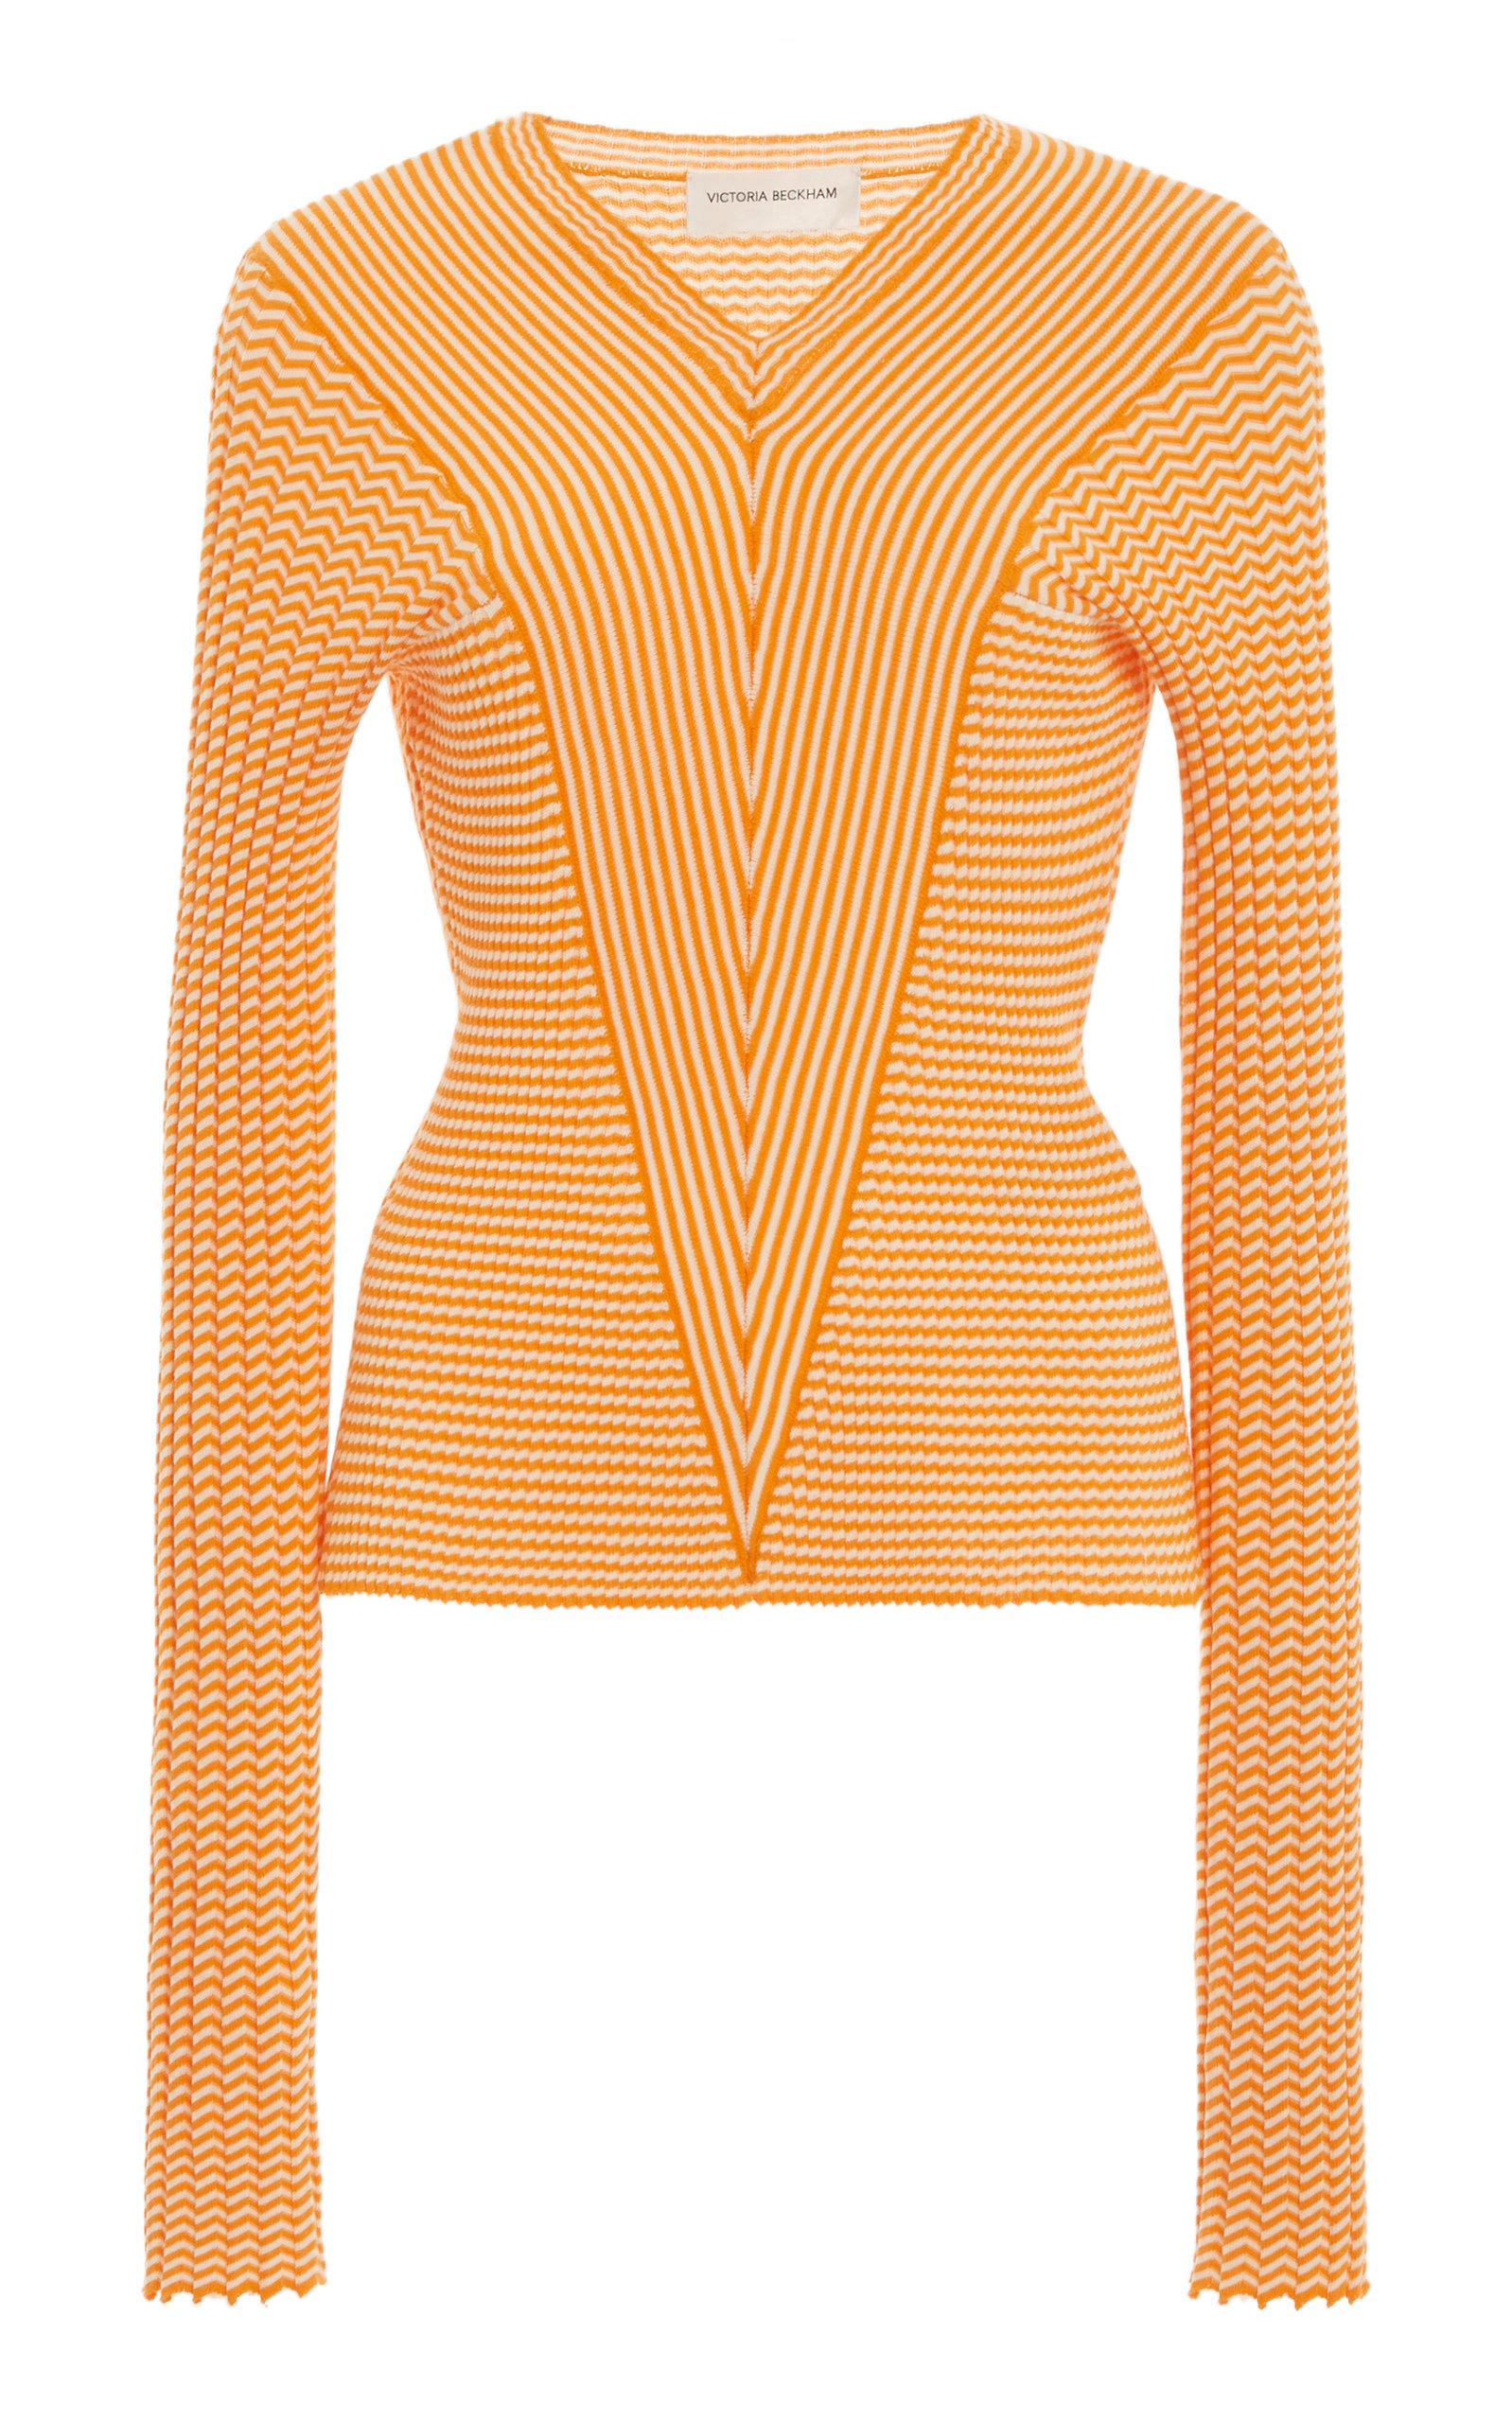 Victoria Beckham Mini Striped Cotton V-neck Top In Orange